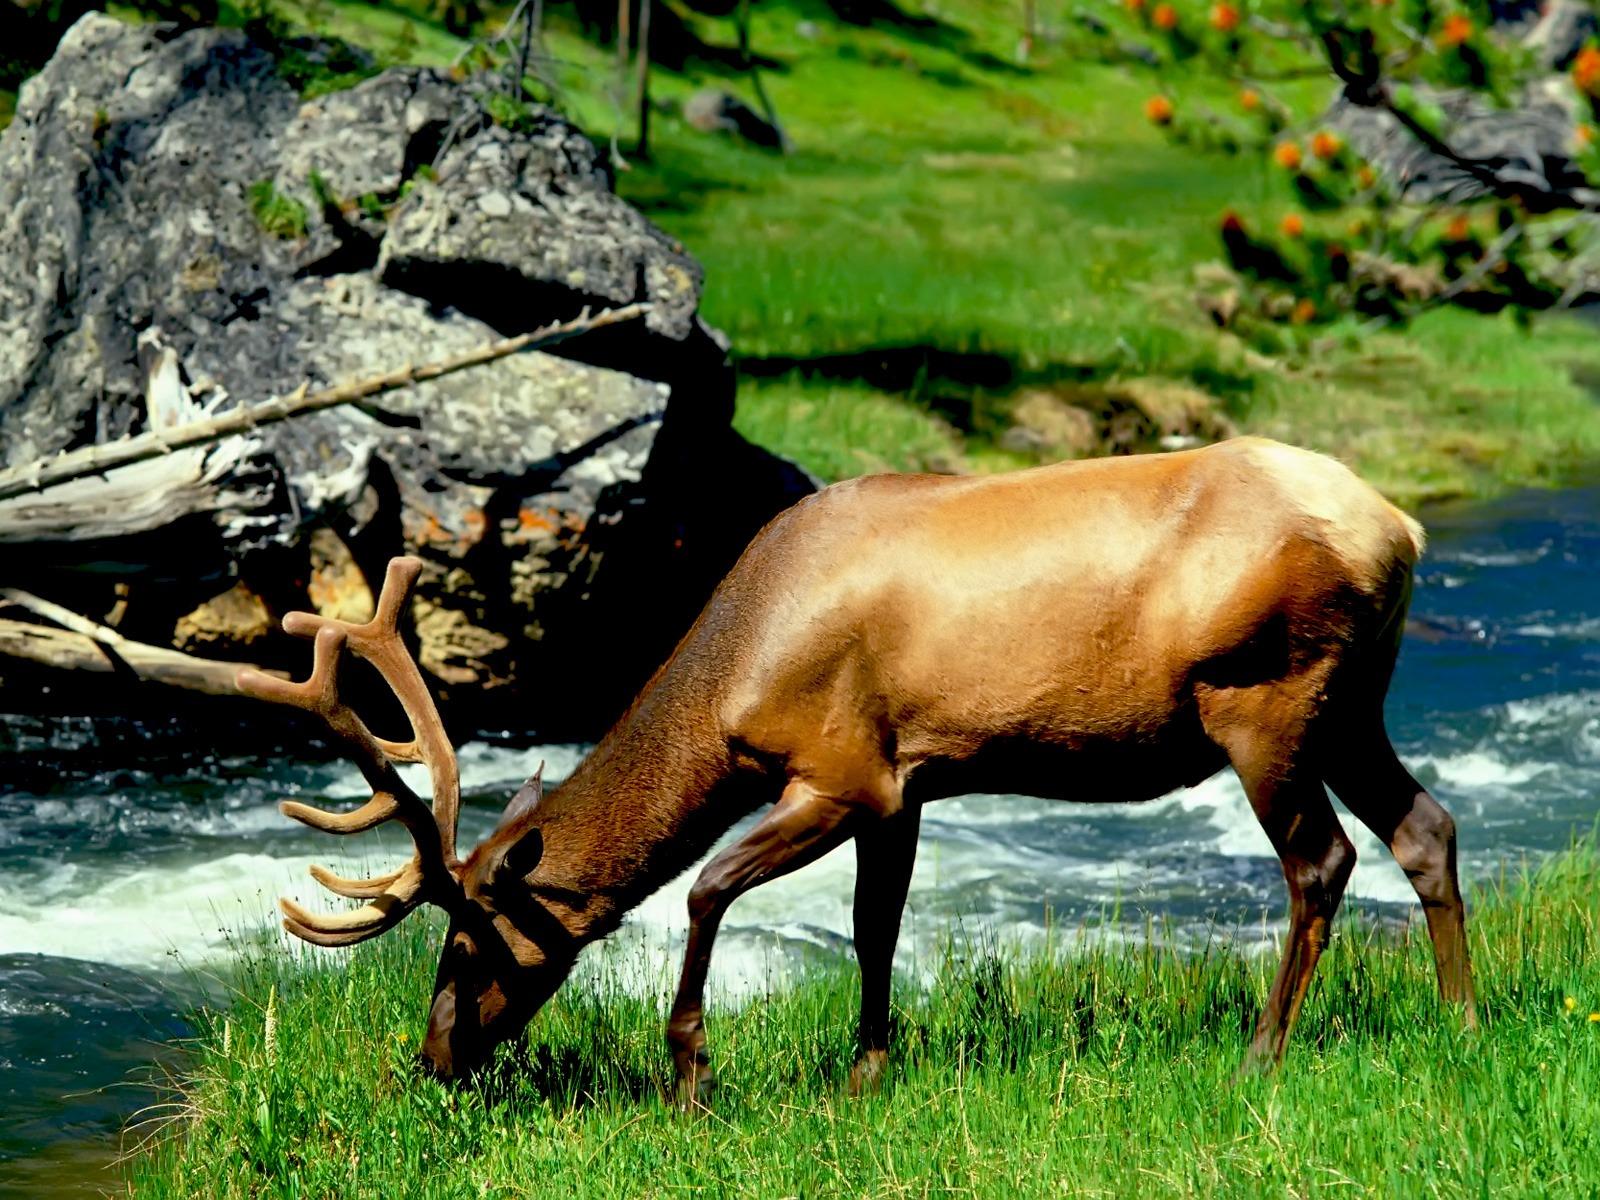 Hd Animal Wallpapers Wild Life Animal Desktop Images: Any Photo Album